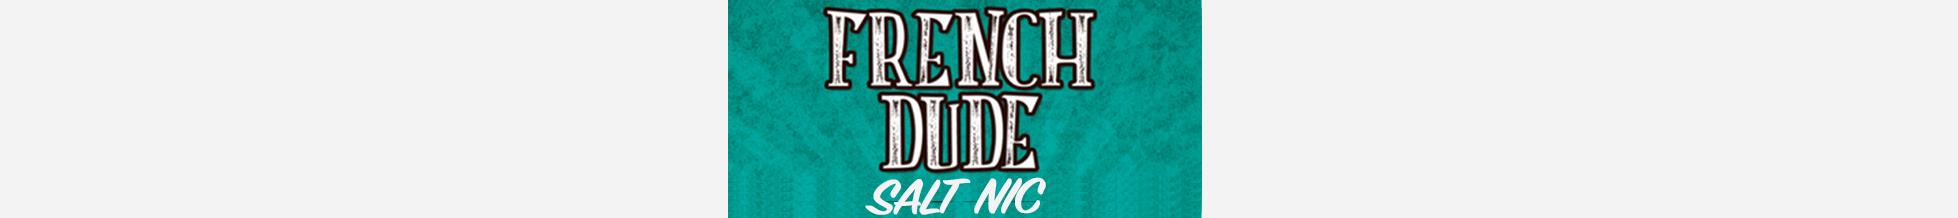 french-dude-salt-nic.jpg